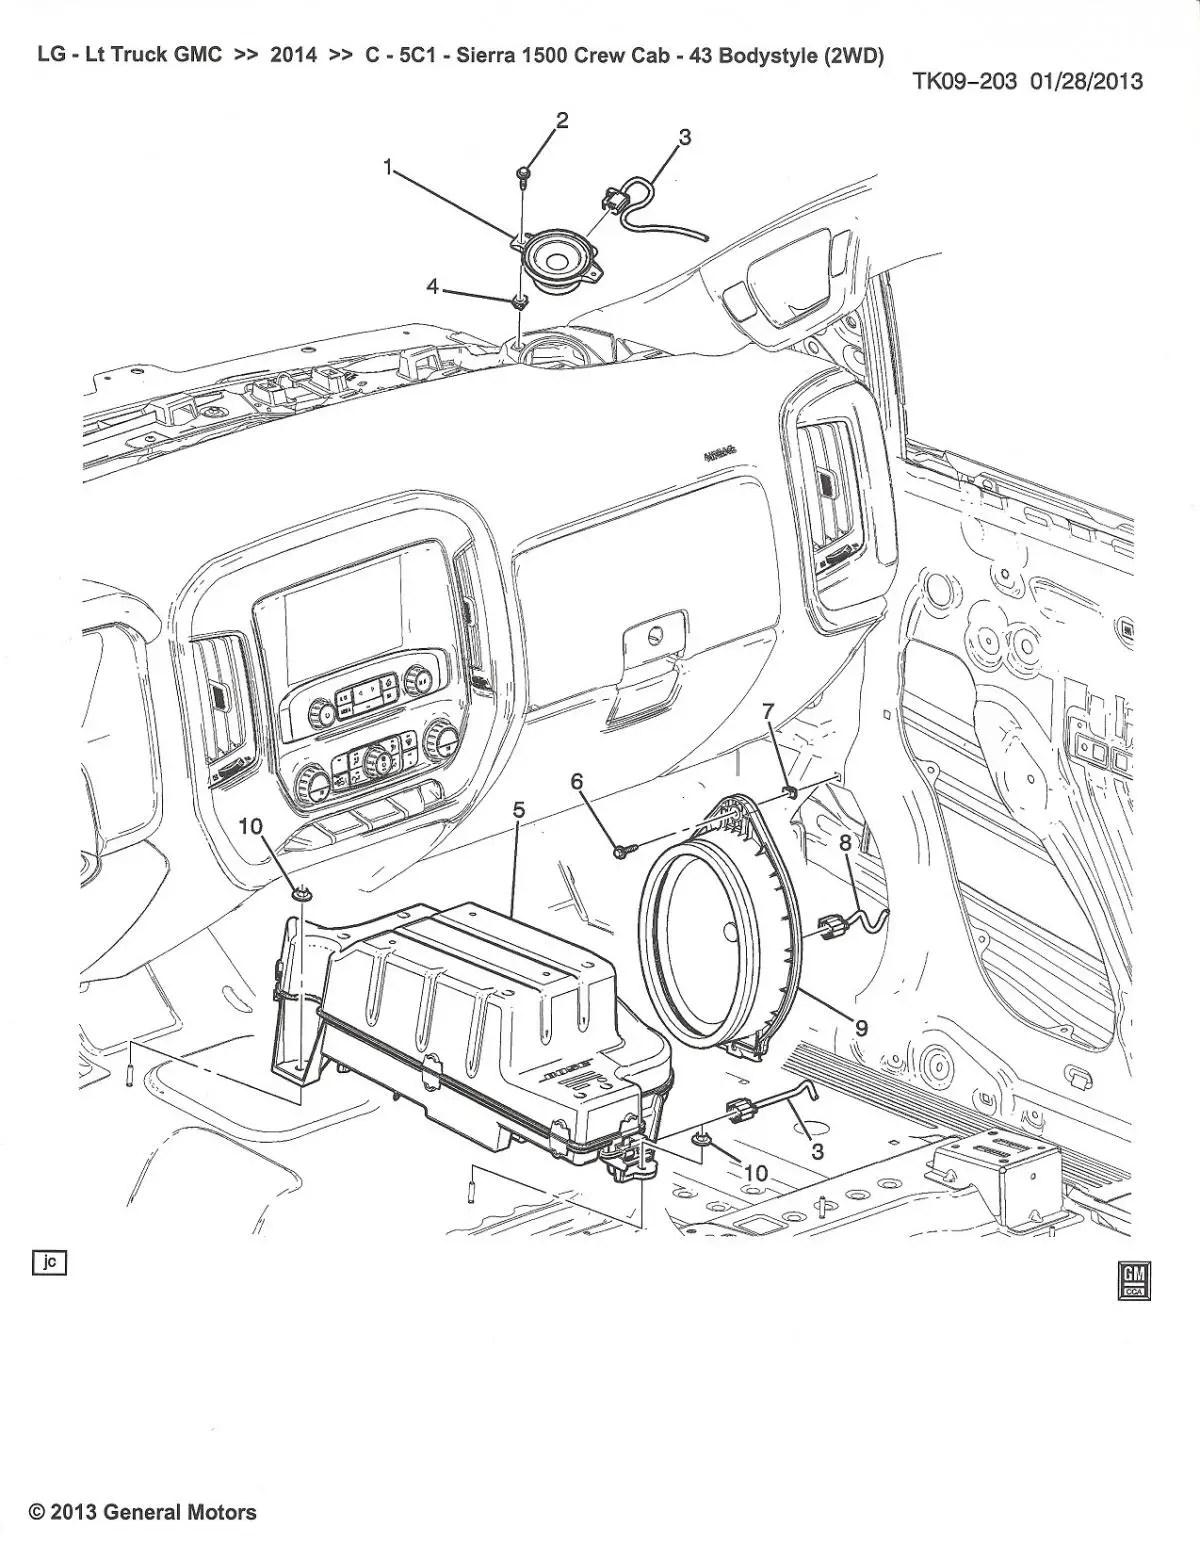 Toyota Camry A C Clutch Light Flashing Wiring Diagram Binatanicom